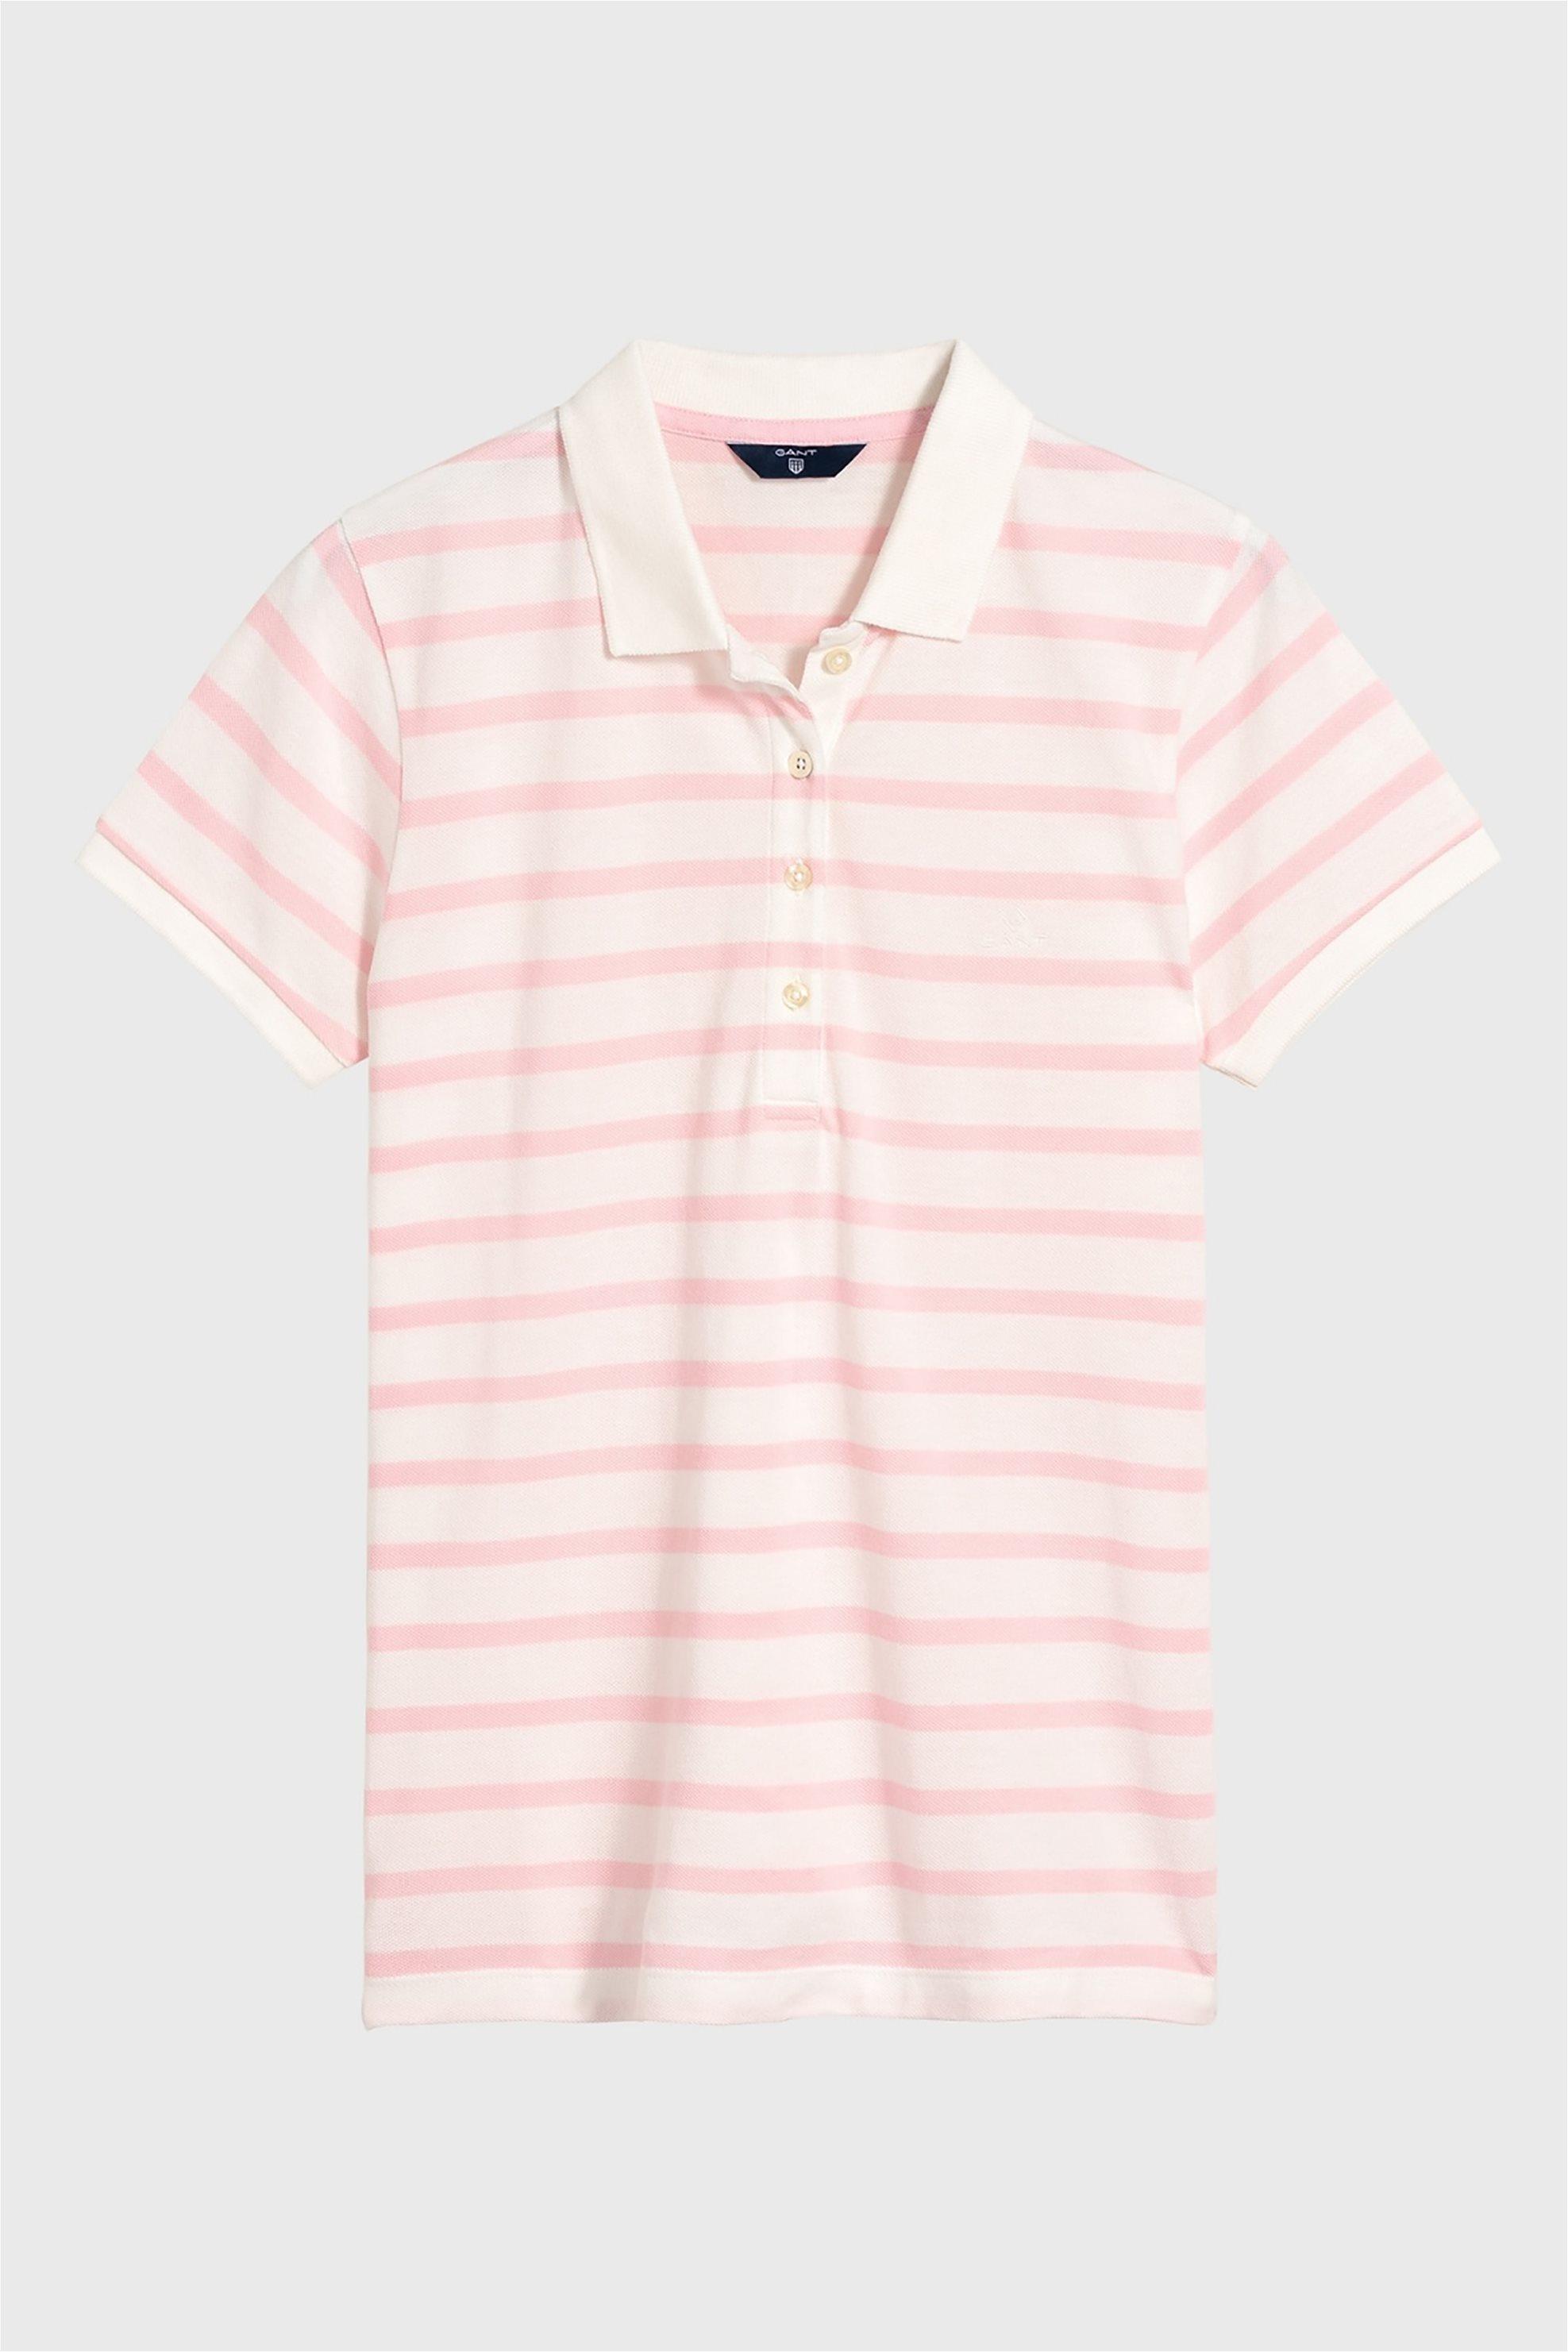 b1ccb2186626 Notos Gant γυναικείο polo κοντομάνικο μπλουζάκι με ρίγες - 4200206 - Ροζ